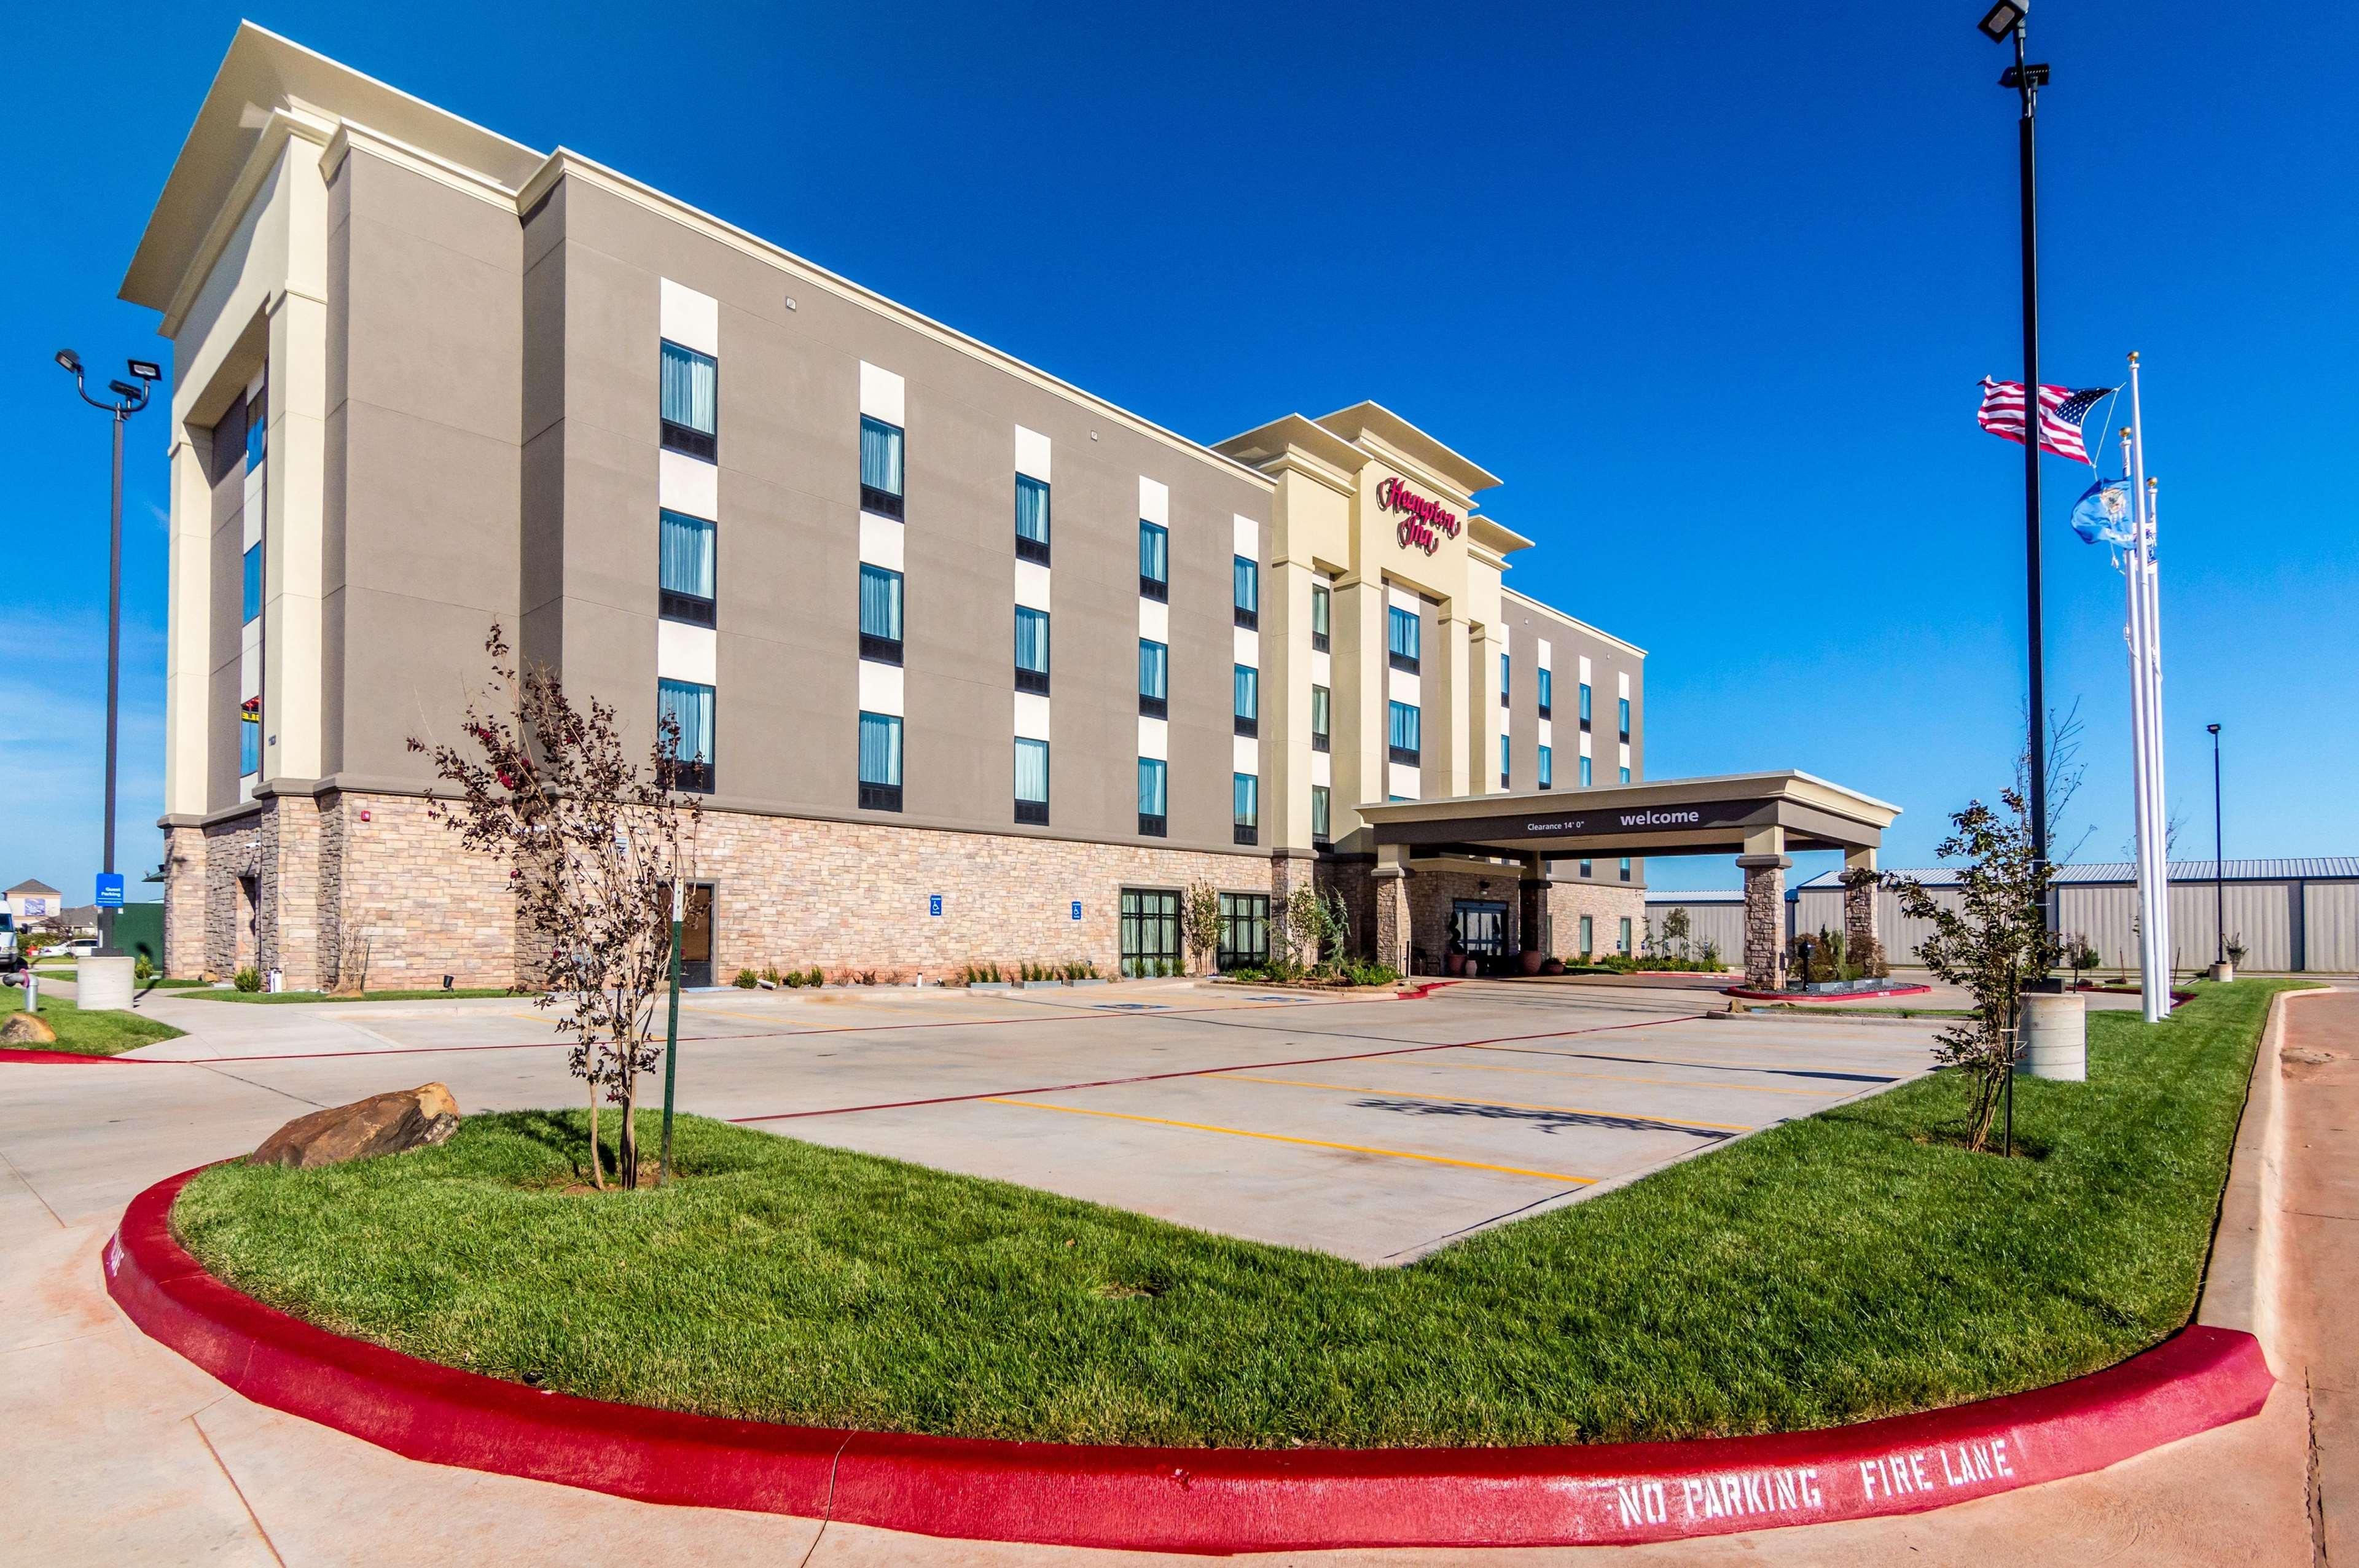 Edmond Oklahoma Hotels Near North University Drive